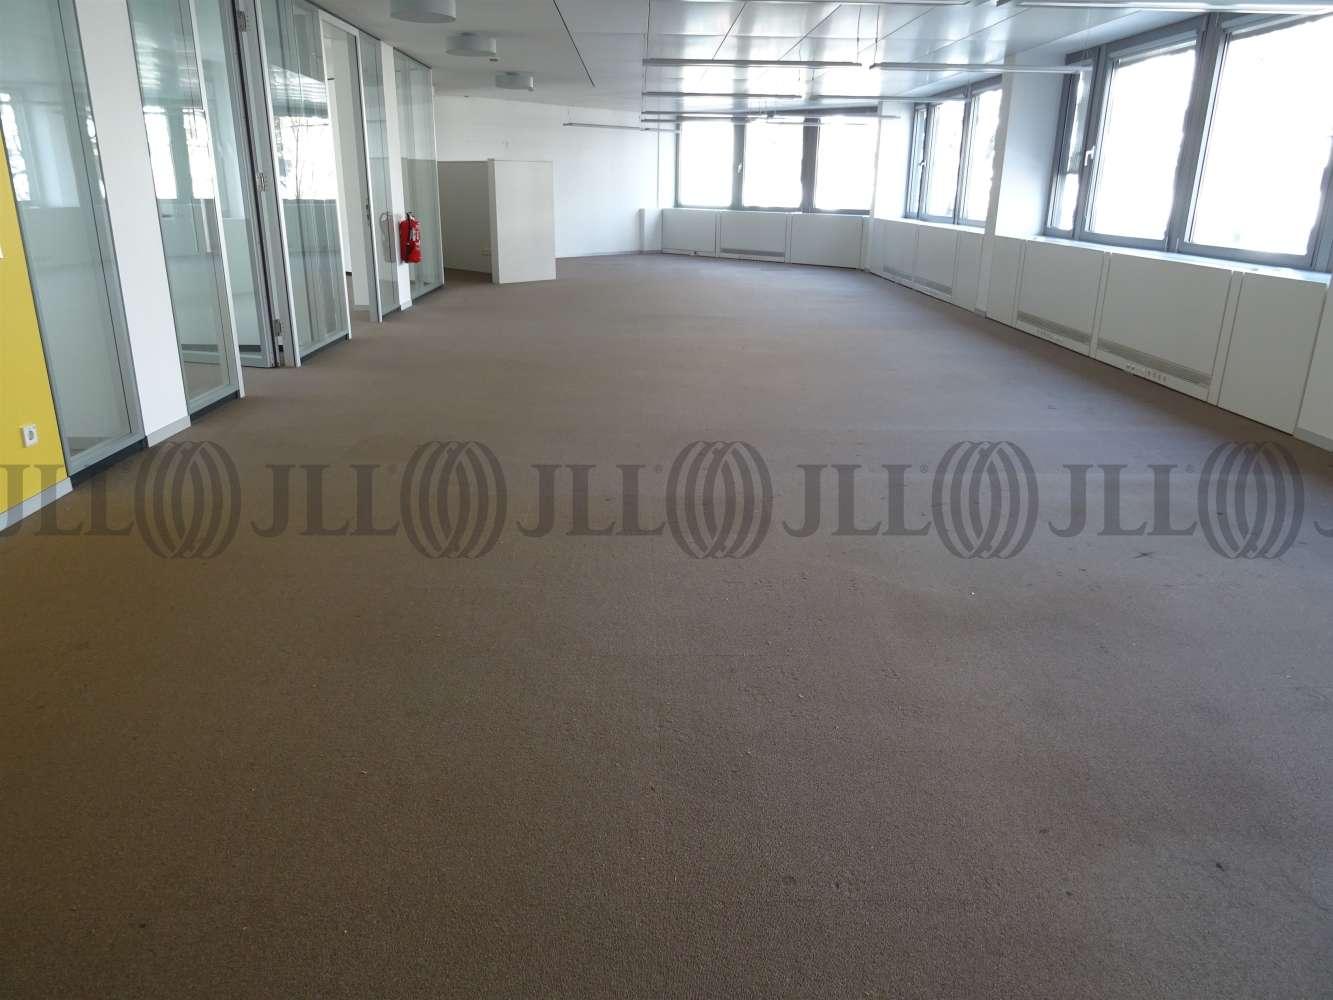 Büros Frankfurt am main, 60325 - Büro - Frankfurt am Main - F0633 - 10030219